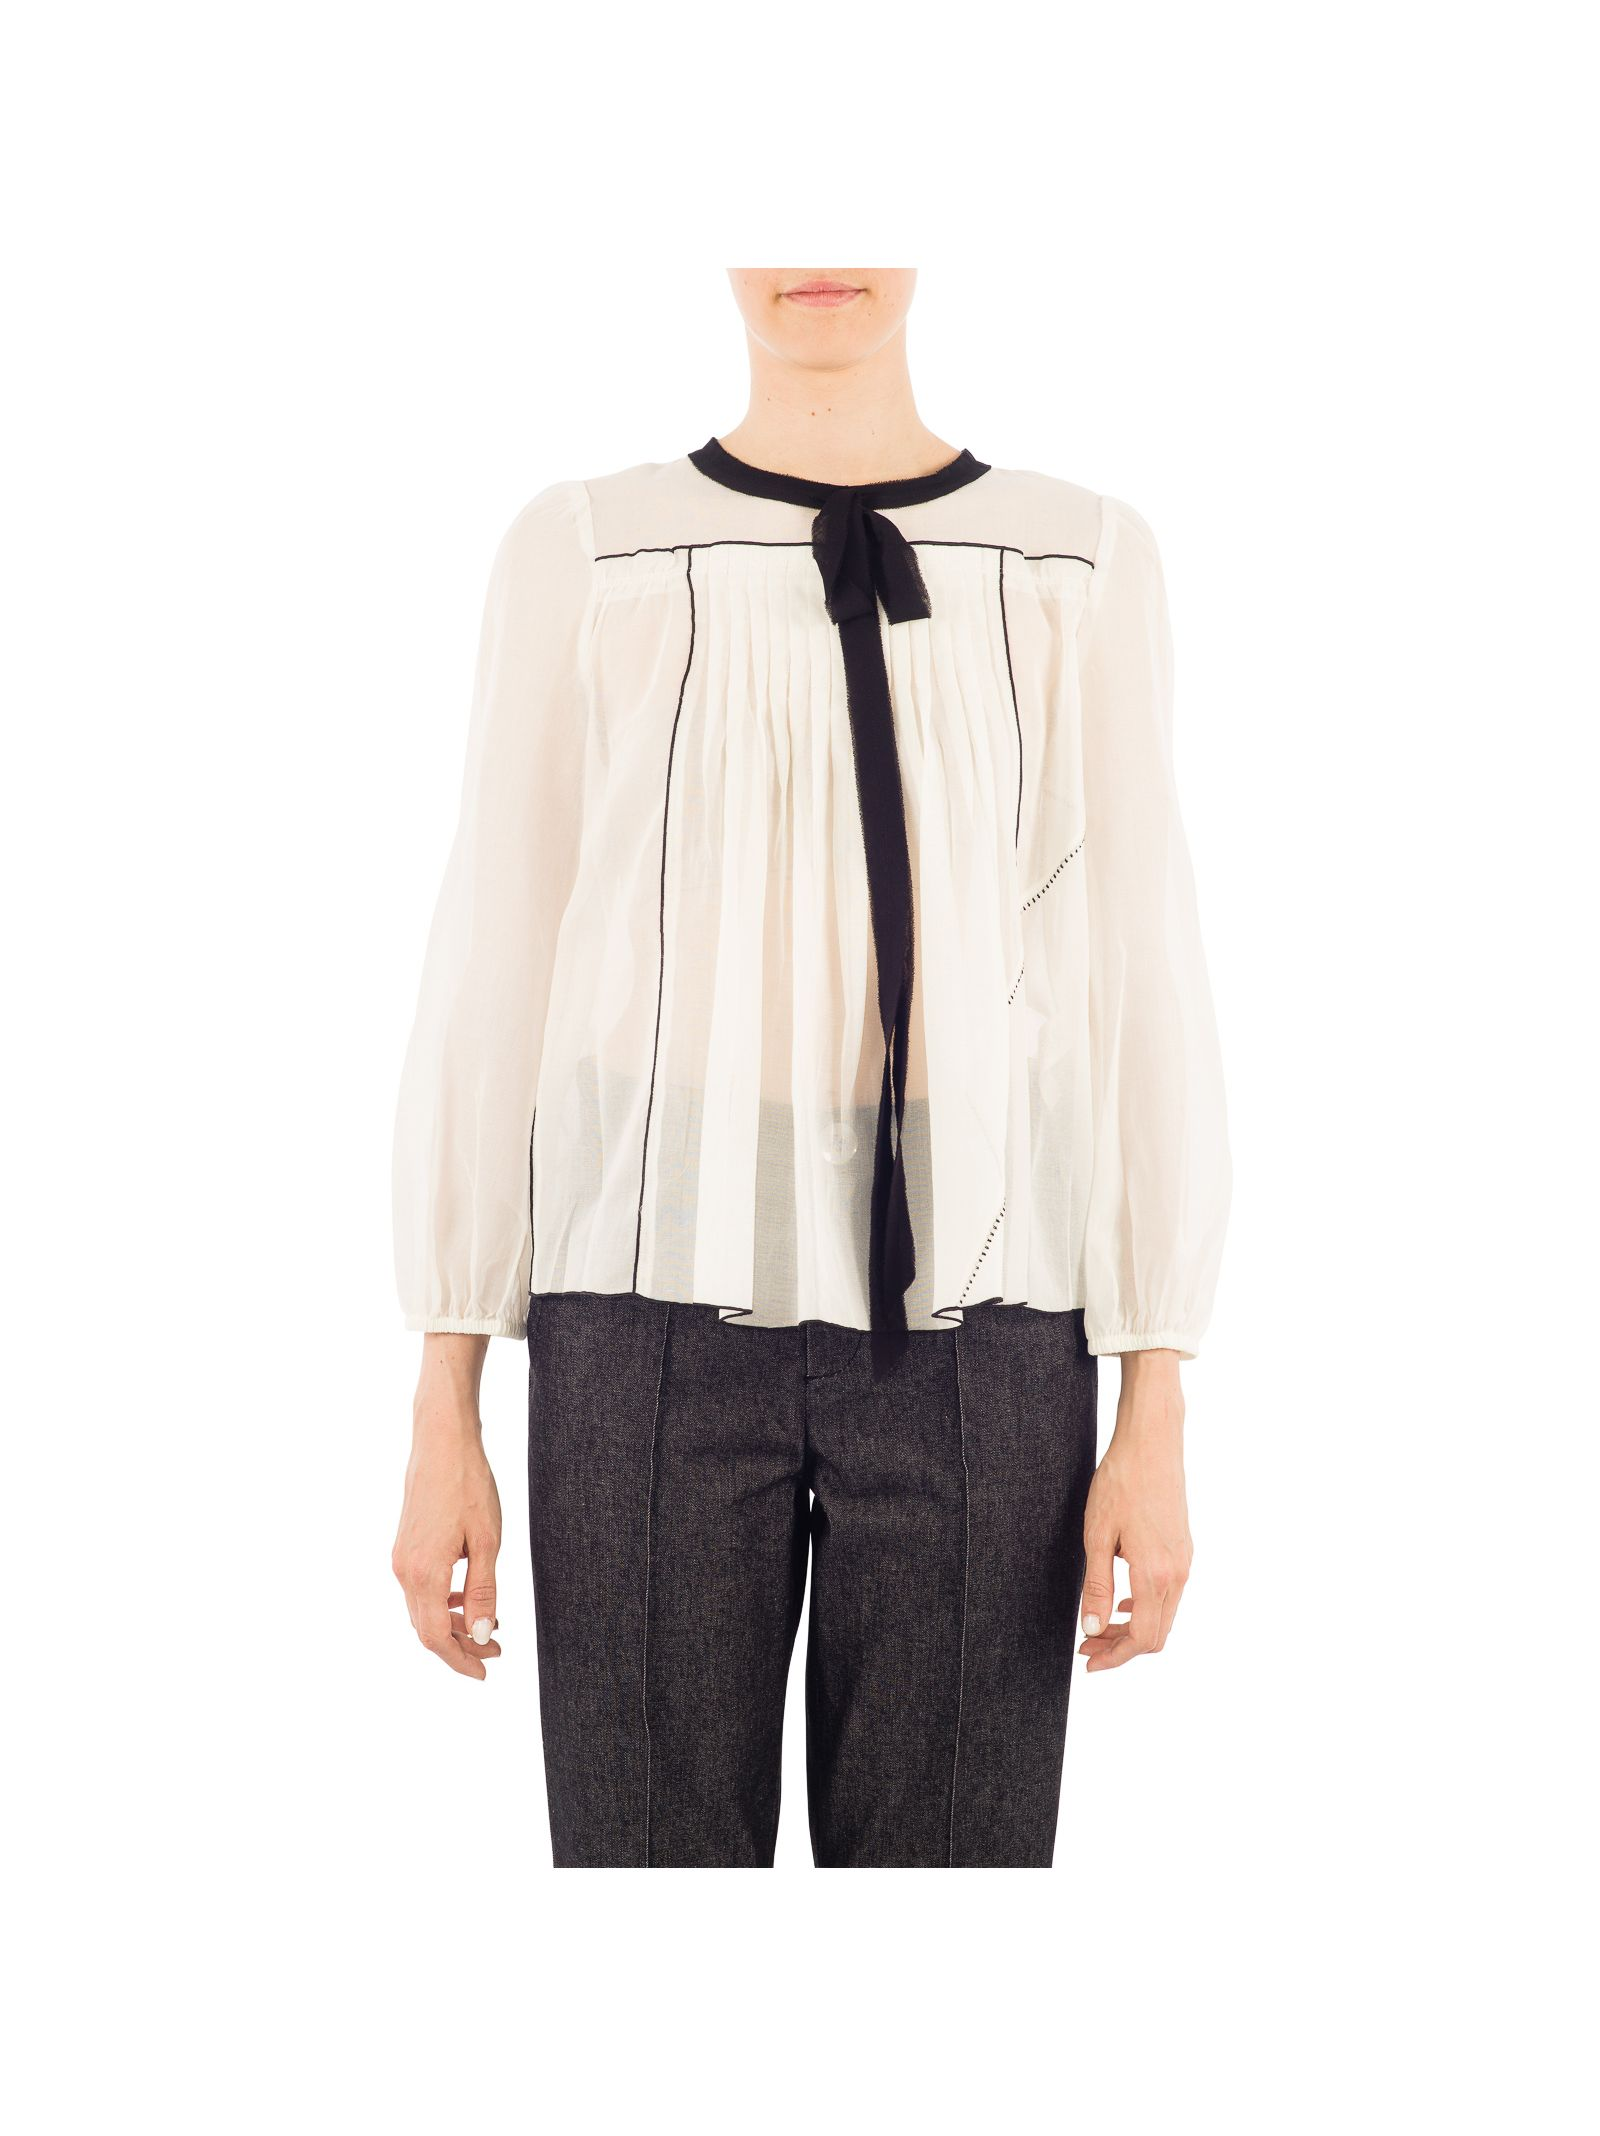 marc jacobs female 45883 marc jacobs white cotton shirt